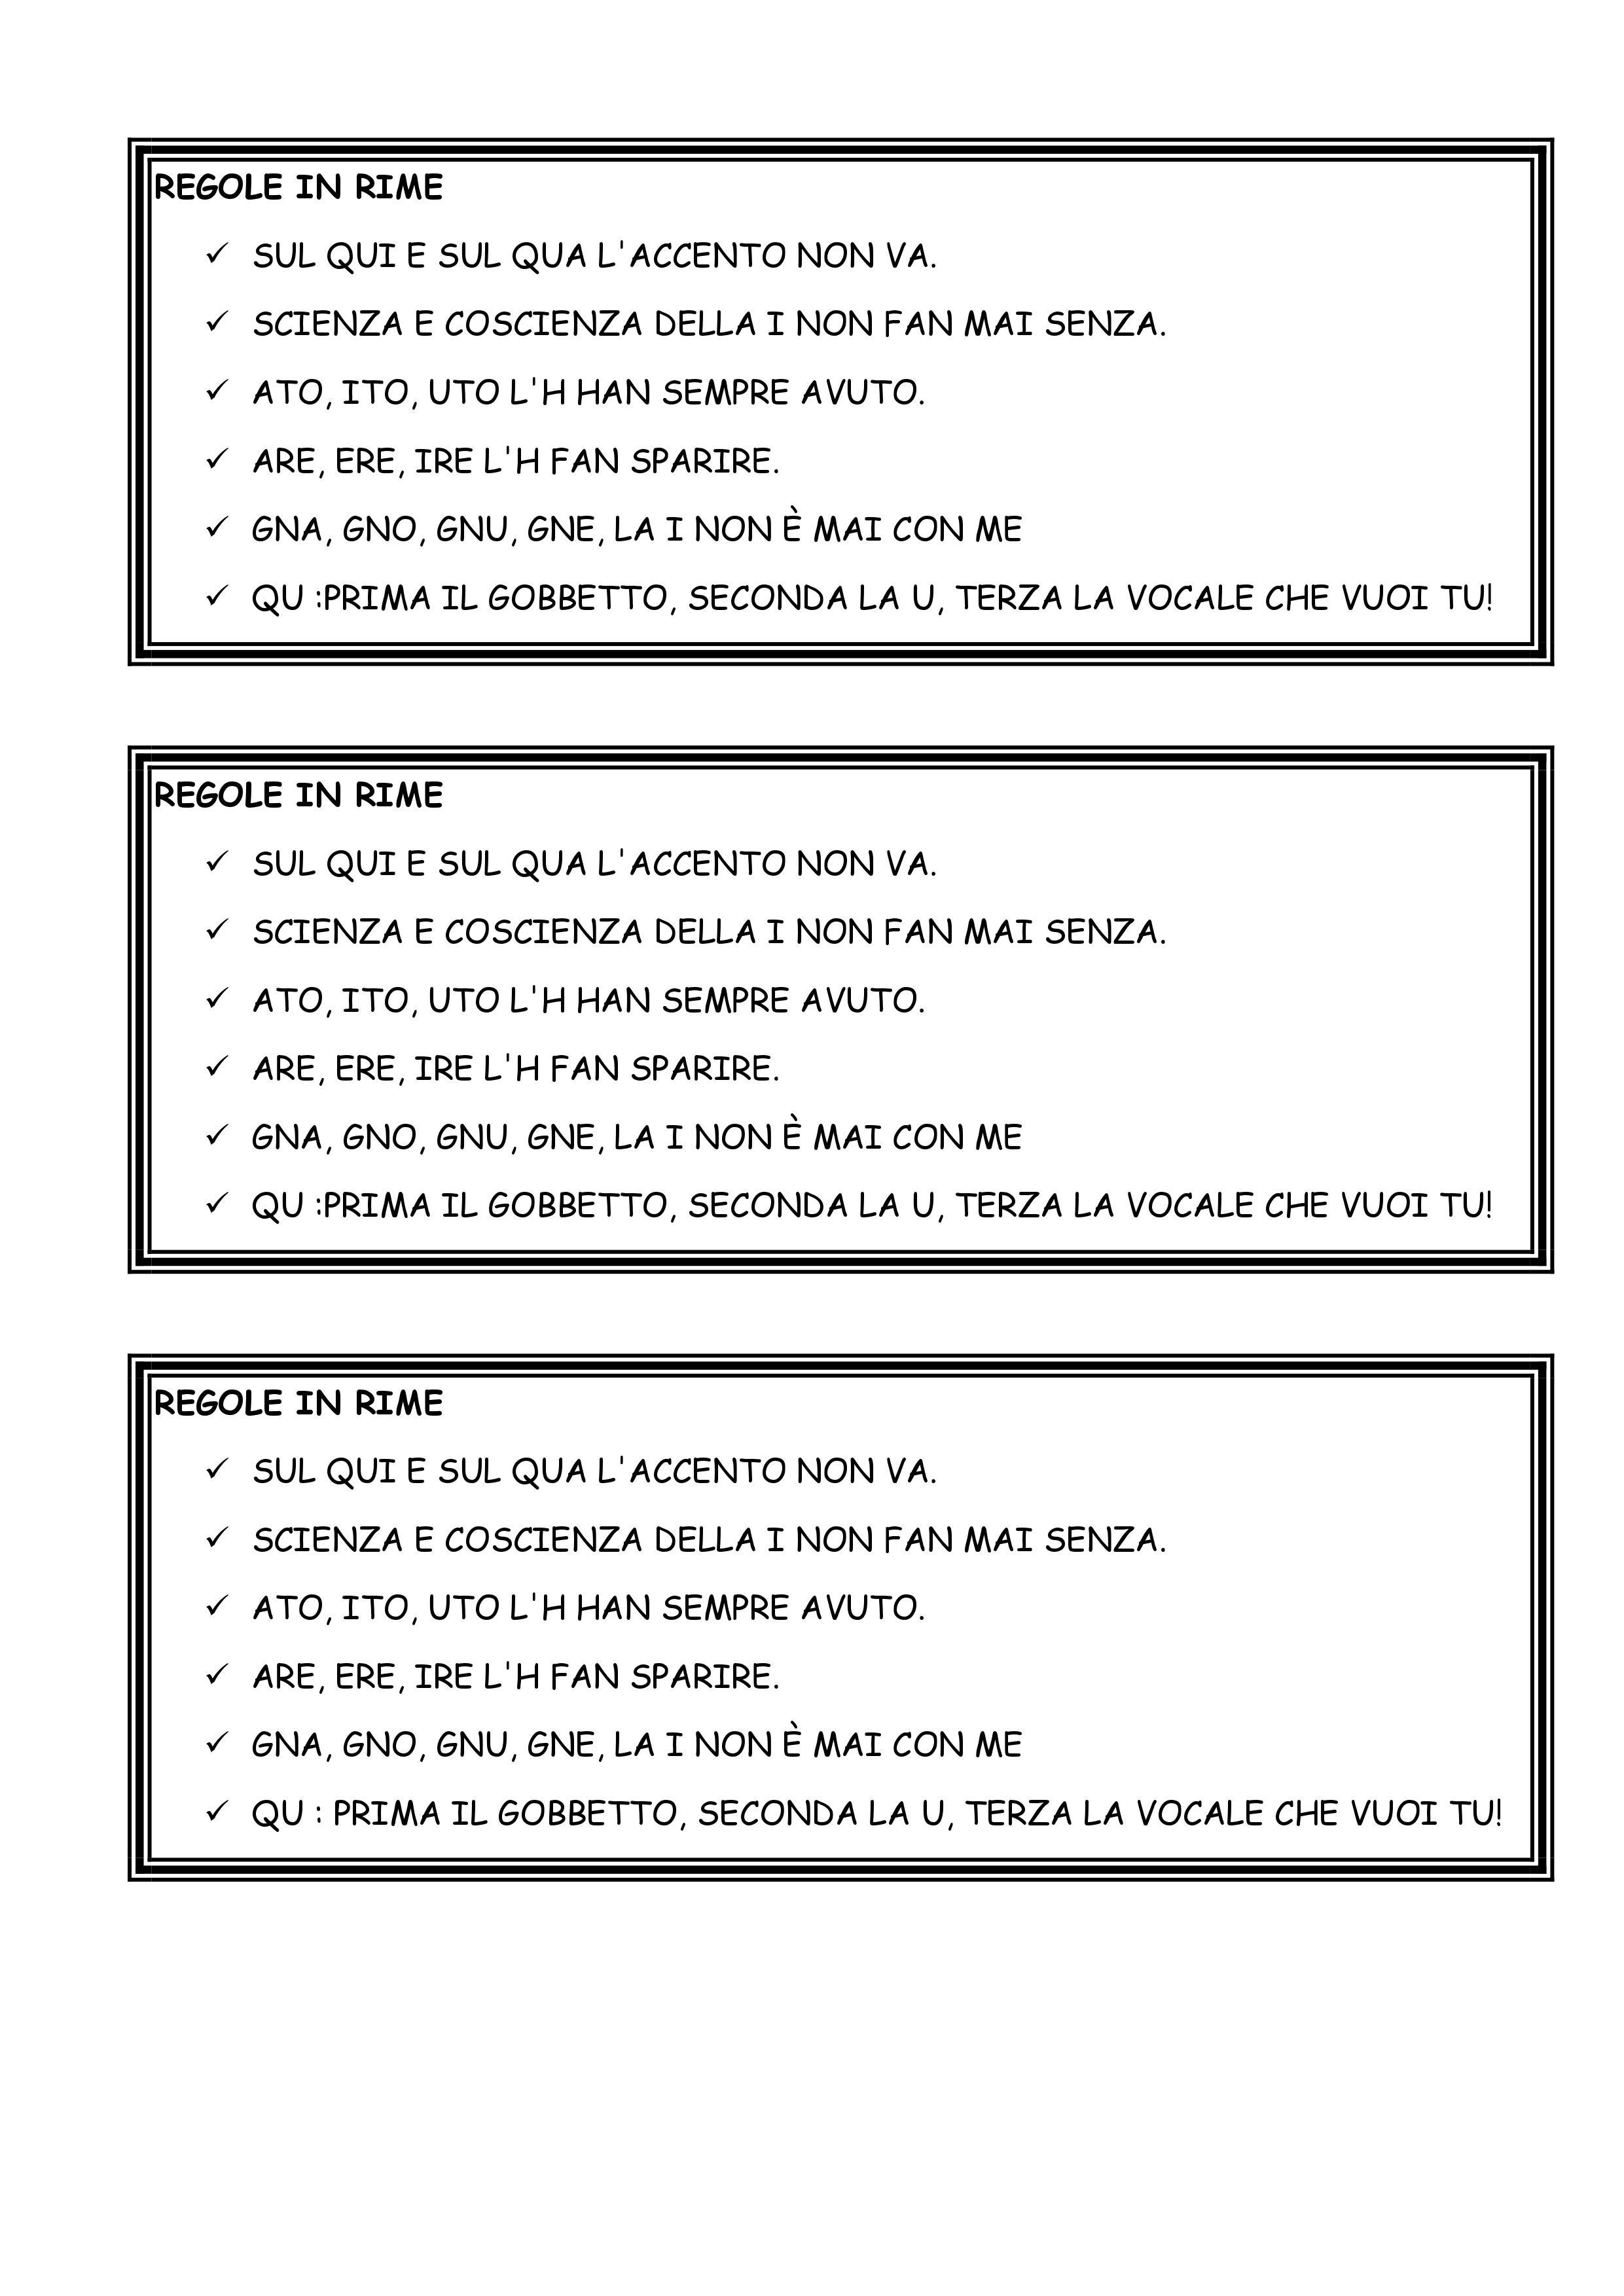 Regole grammaticali inglese pdf to word